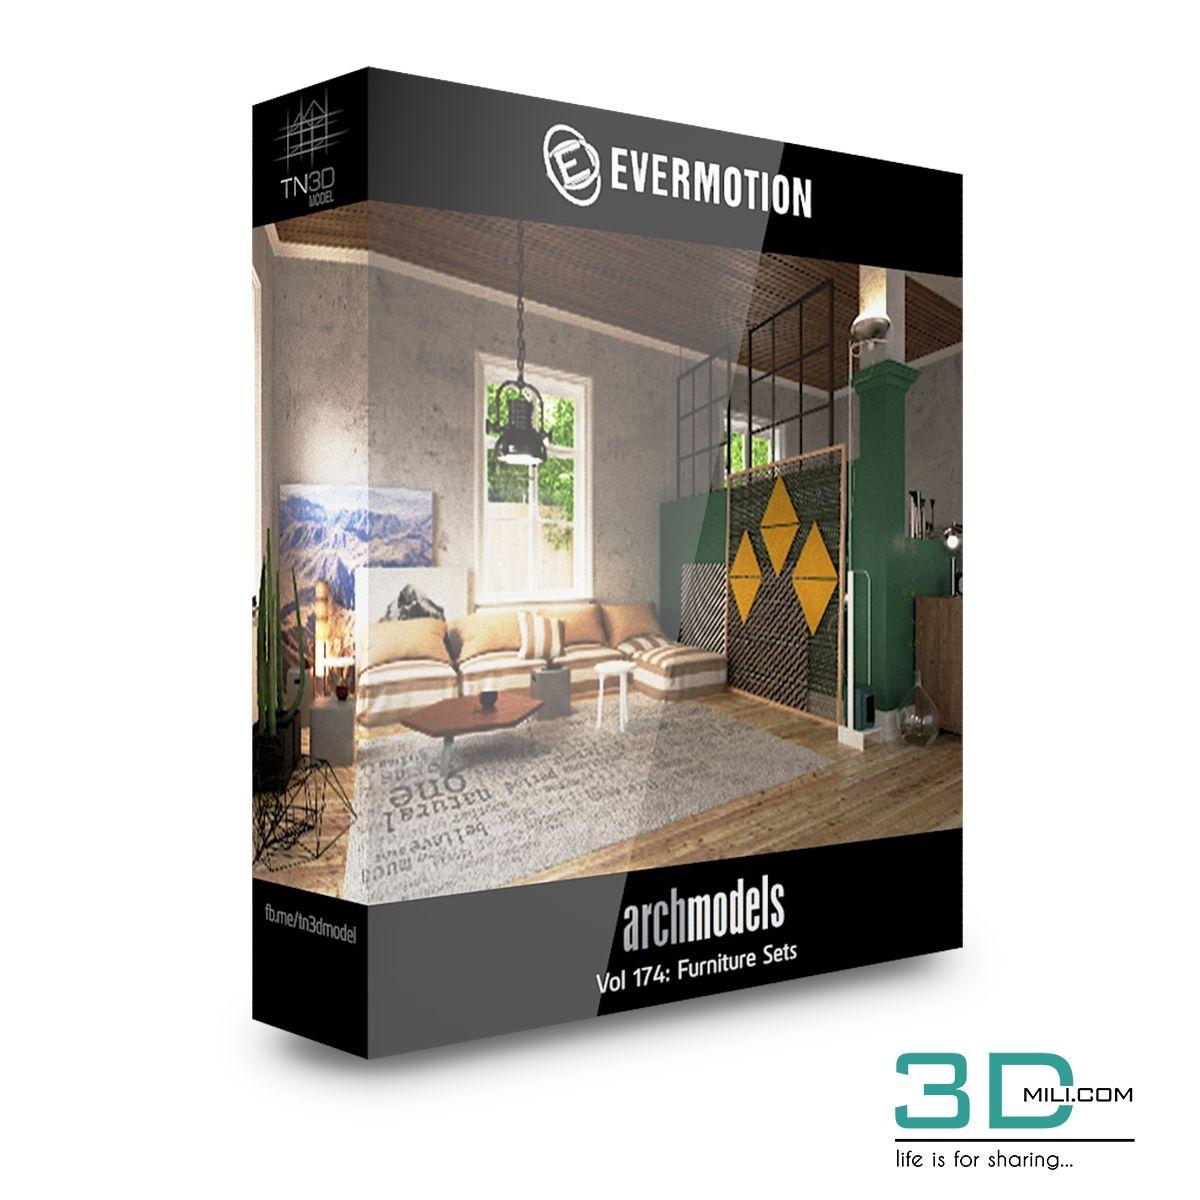 Evermotion Archmodels Vol 174: Furniture Sets - 3D Mili